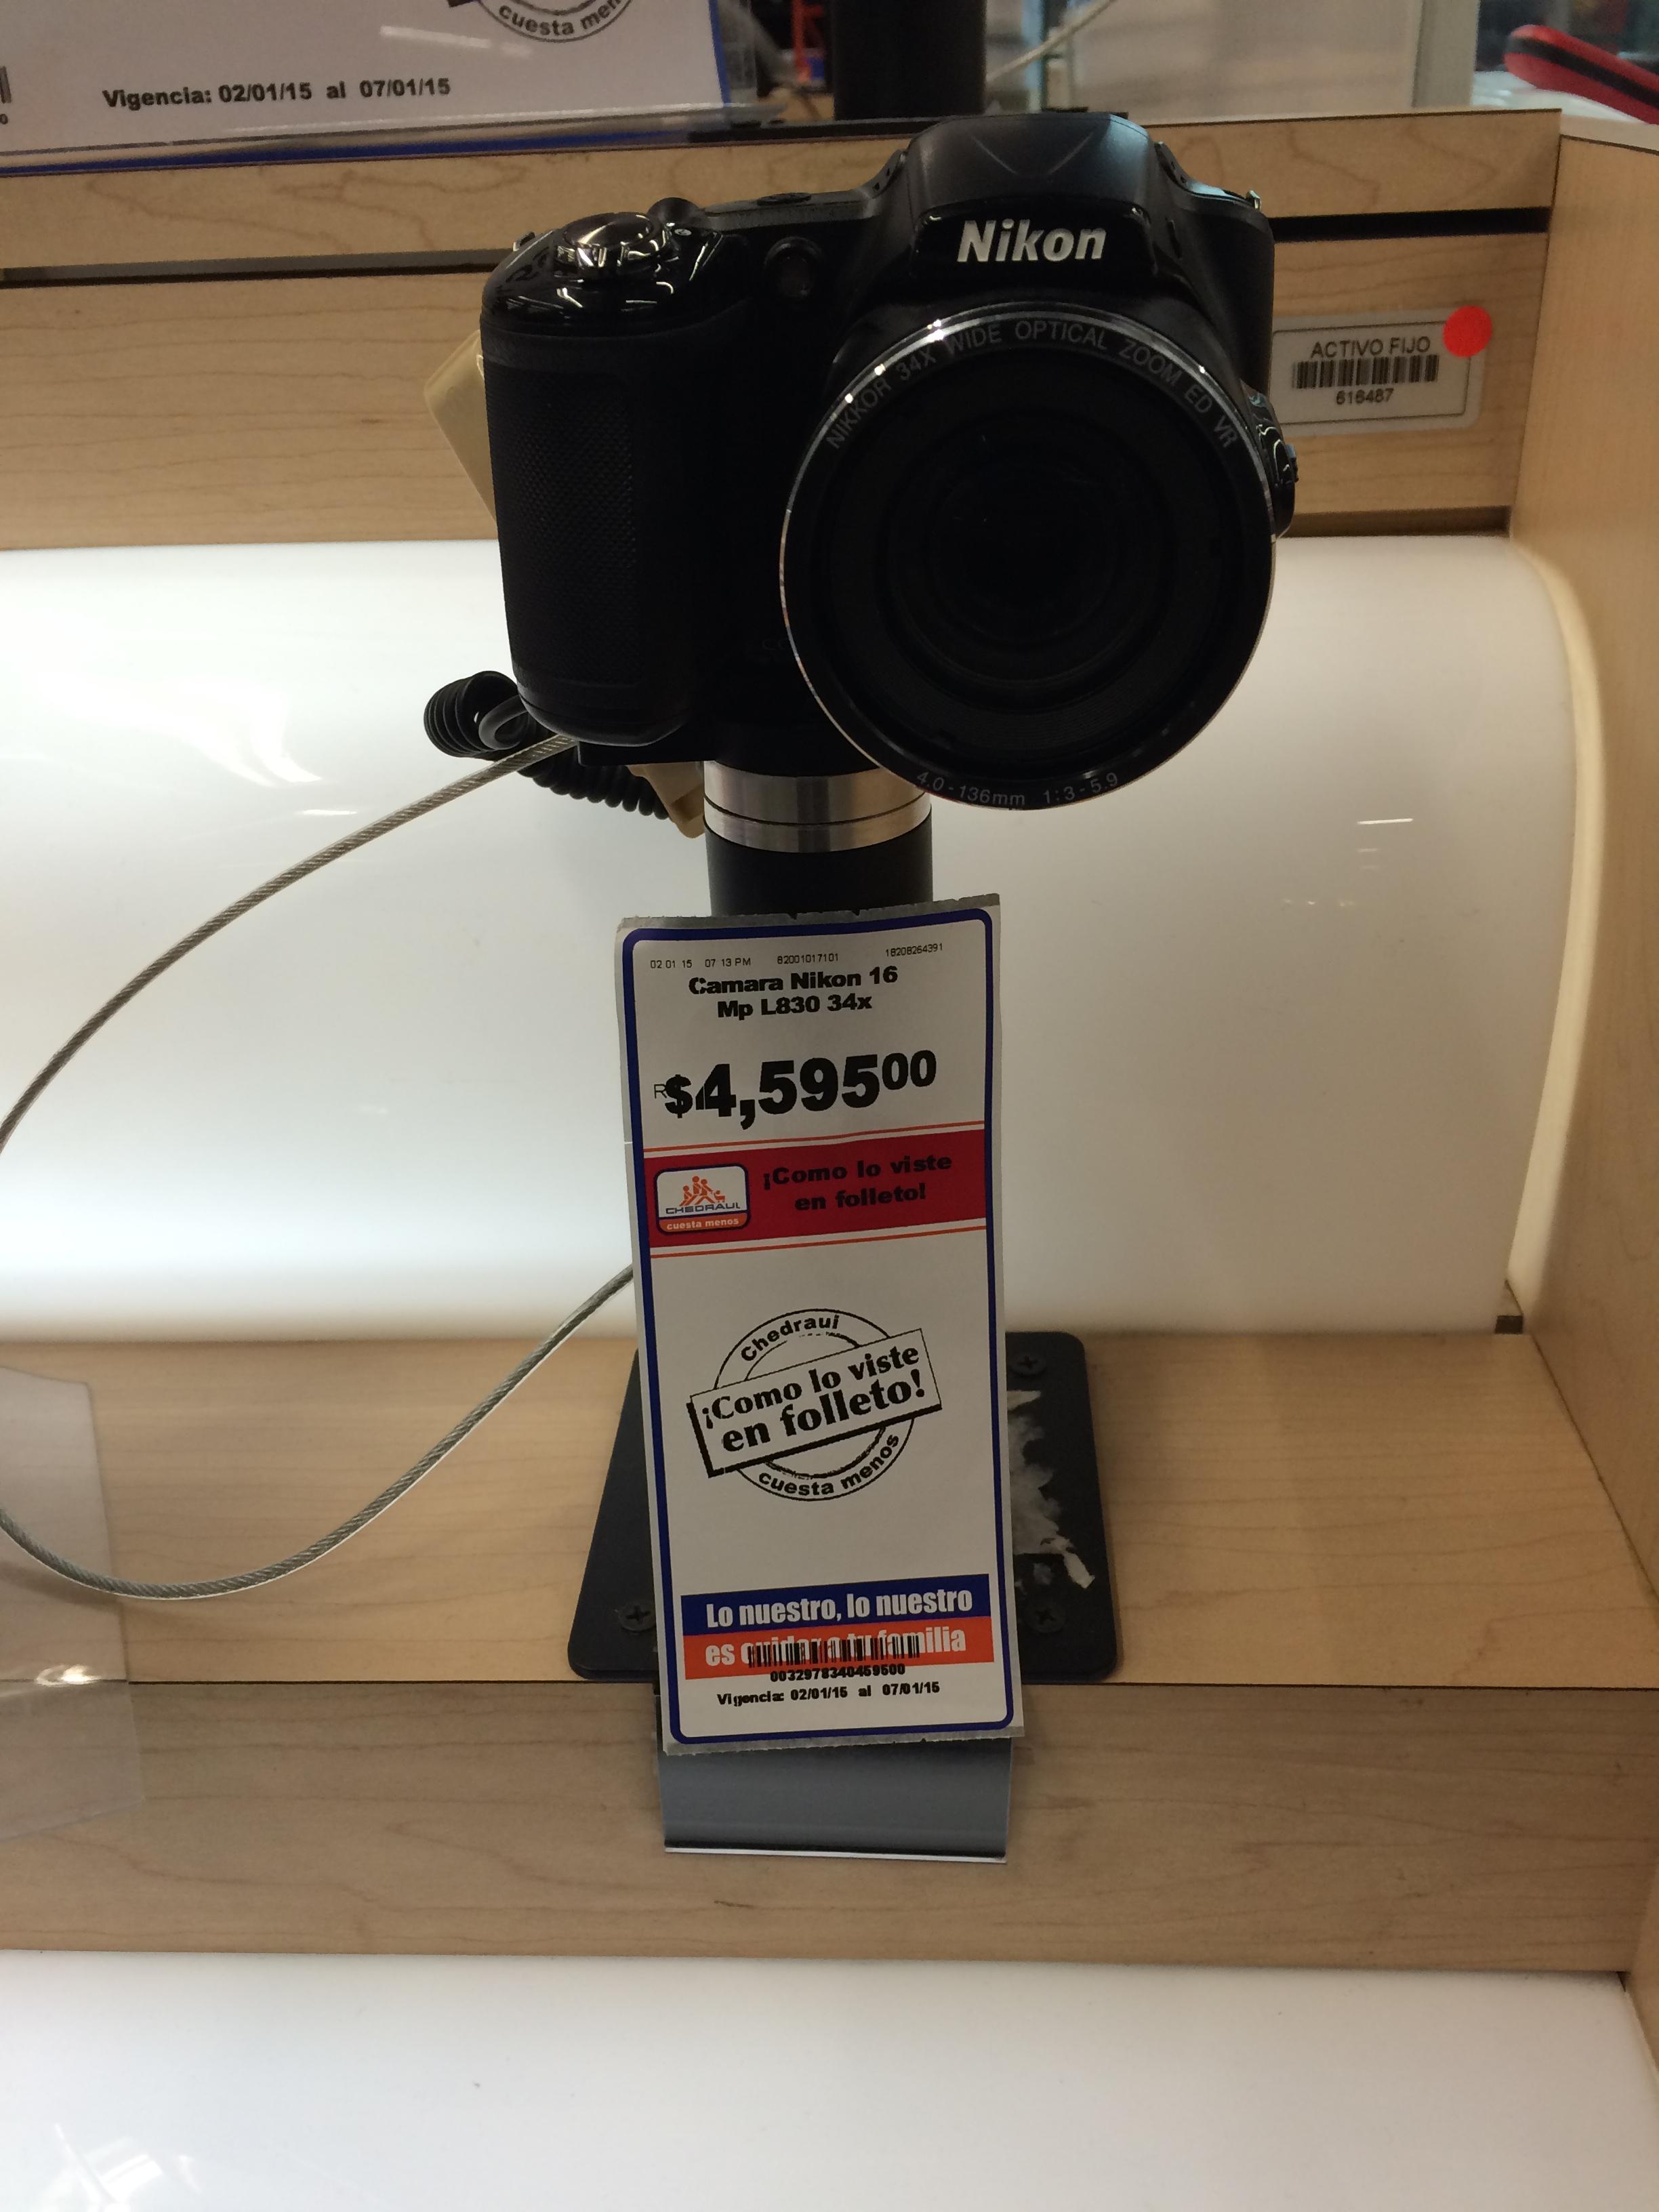 Chedraui: cámara Nikon L830 a $4,595